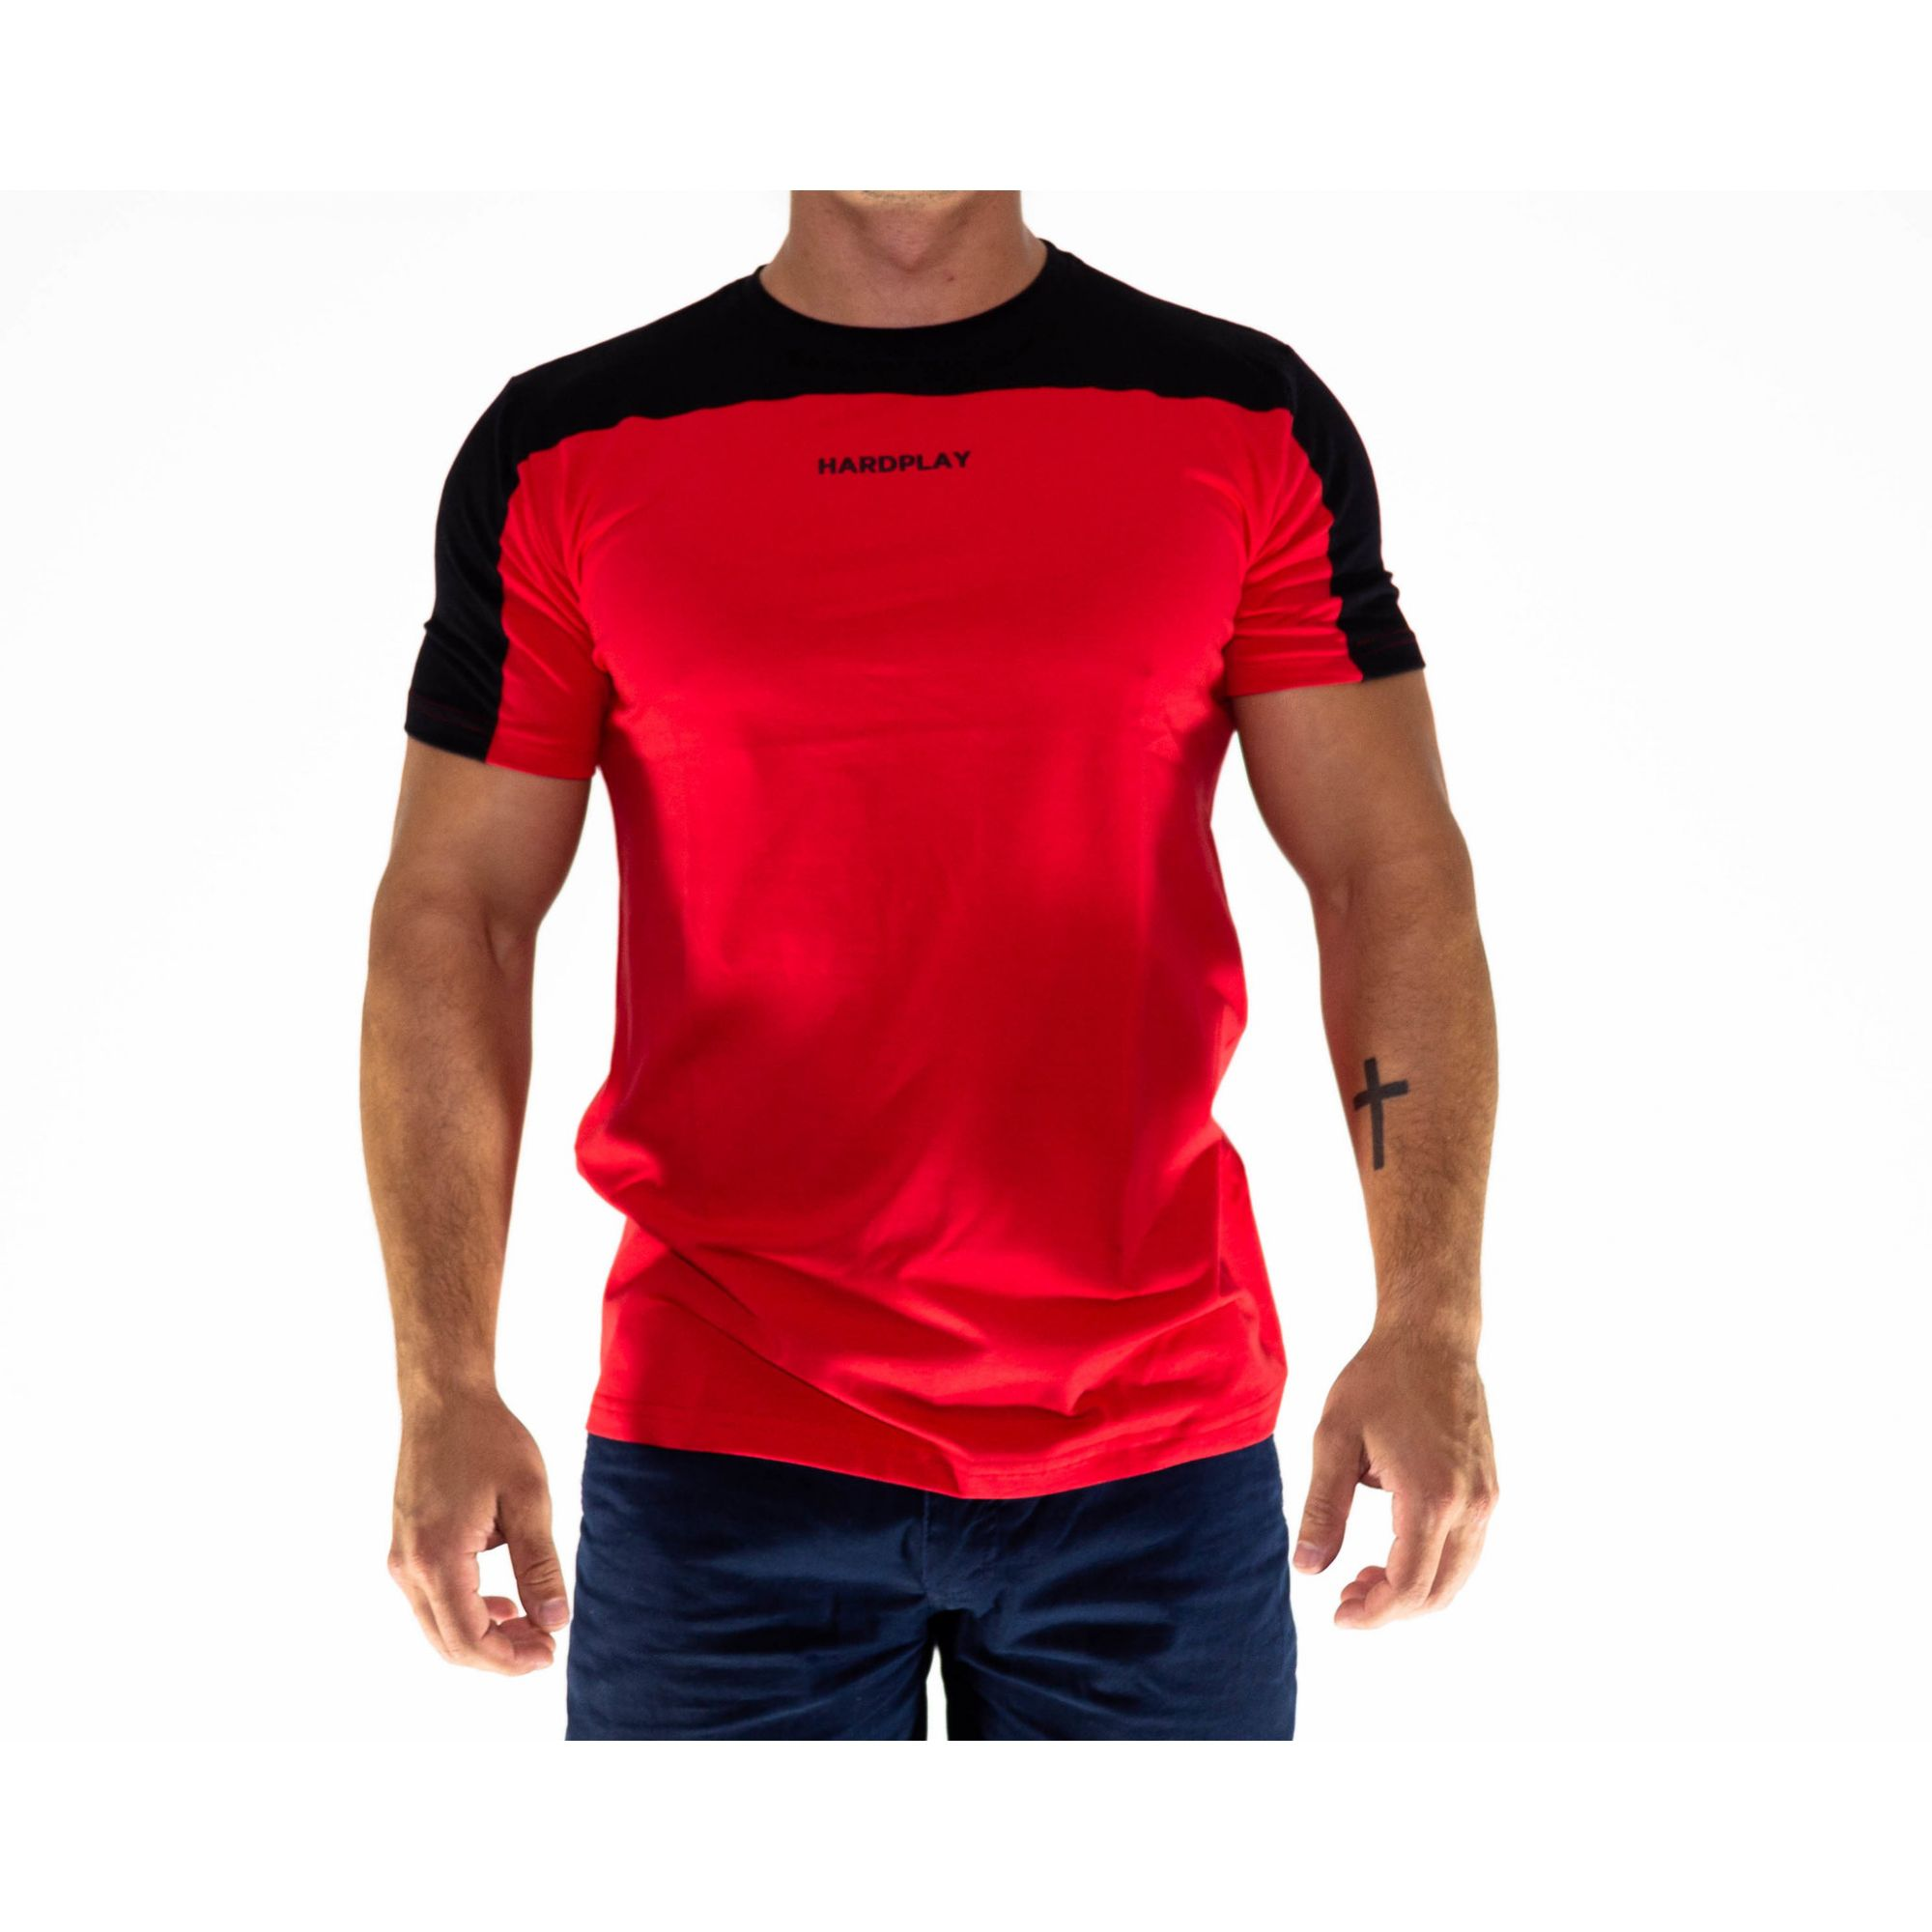 Camiseta HardPlay Recorte  Vermelha e Preto Basic